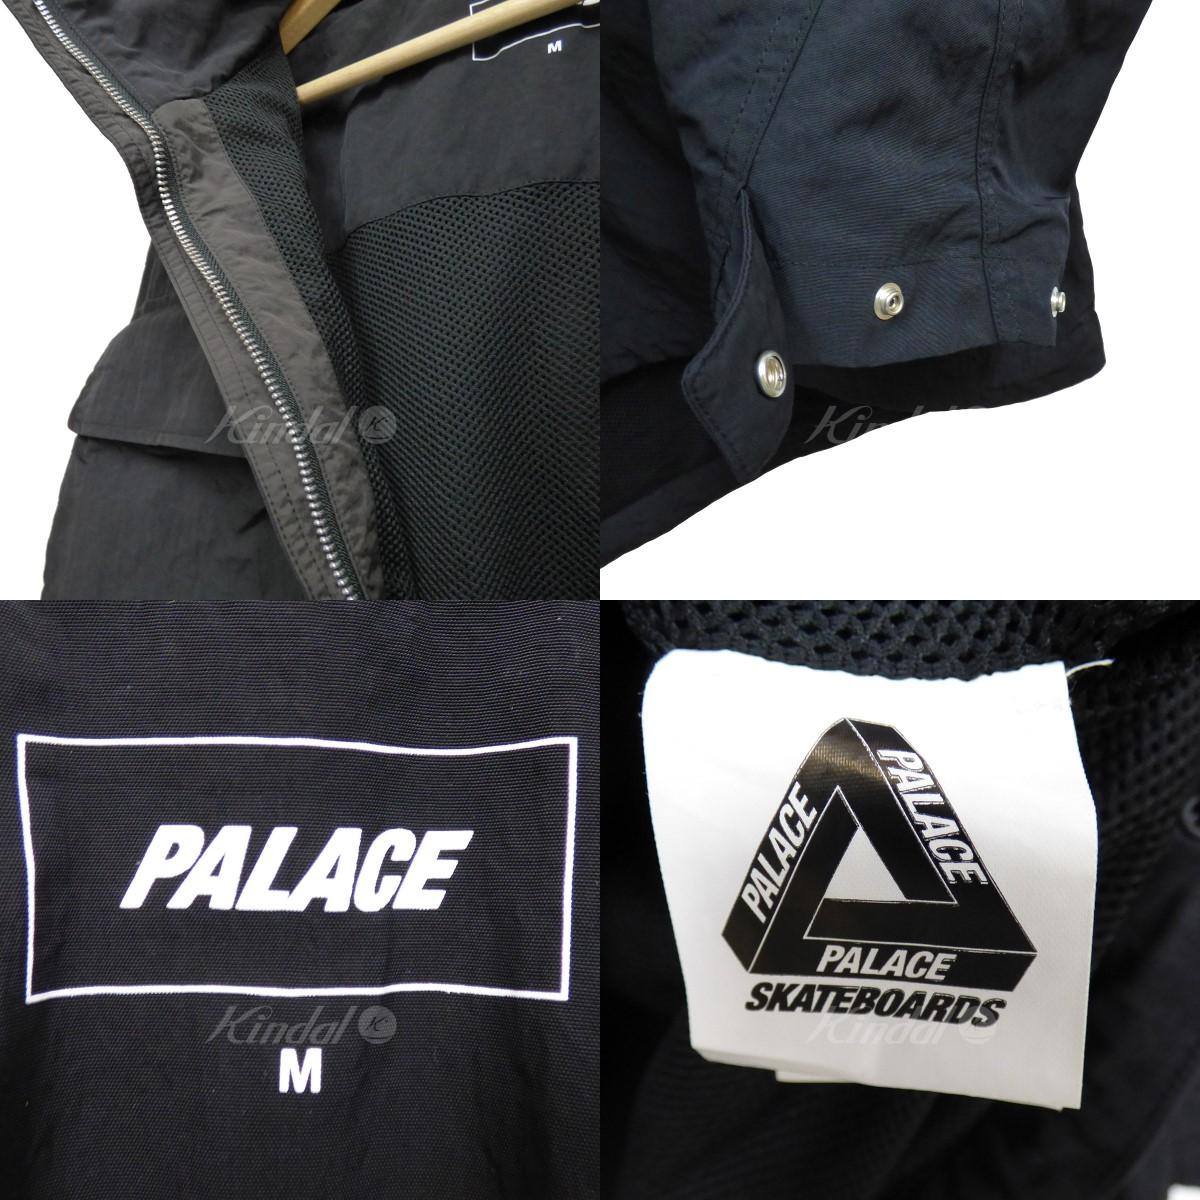 79ddf2cd4b63 kindal  PALACE 18AW BELLO JACKET nylon anorak long jacket black size ...